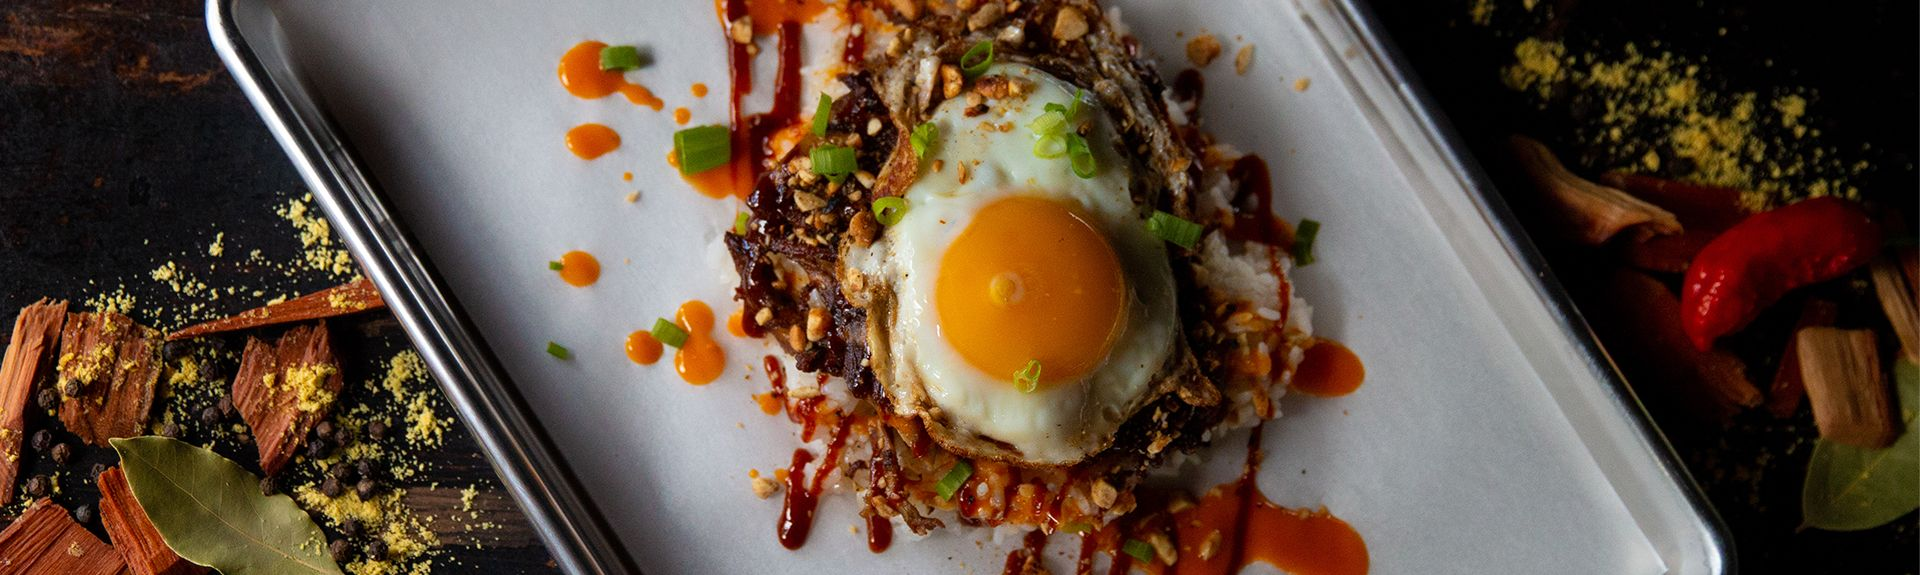 Sunny side up egg over crispy pulled pork on white rice